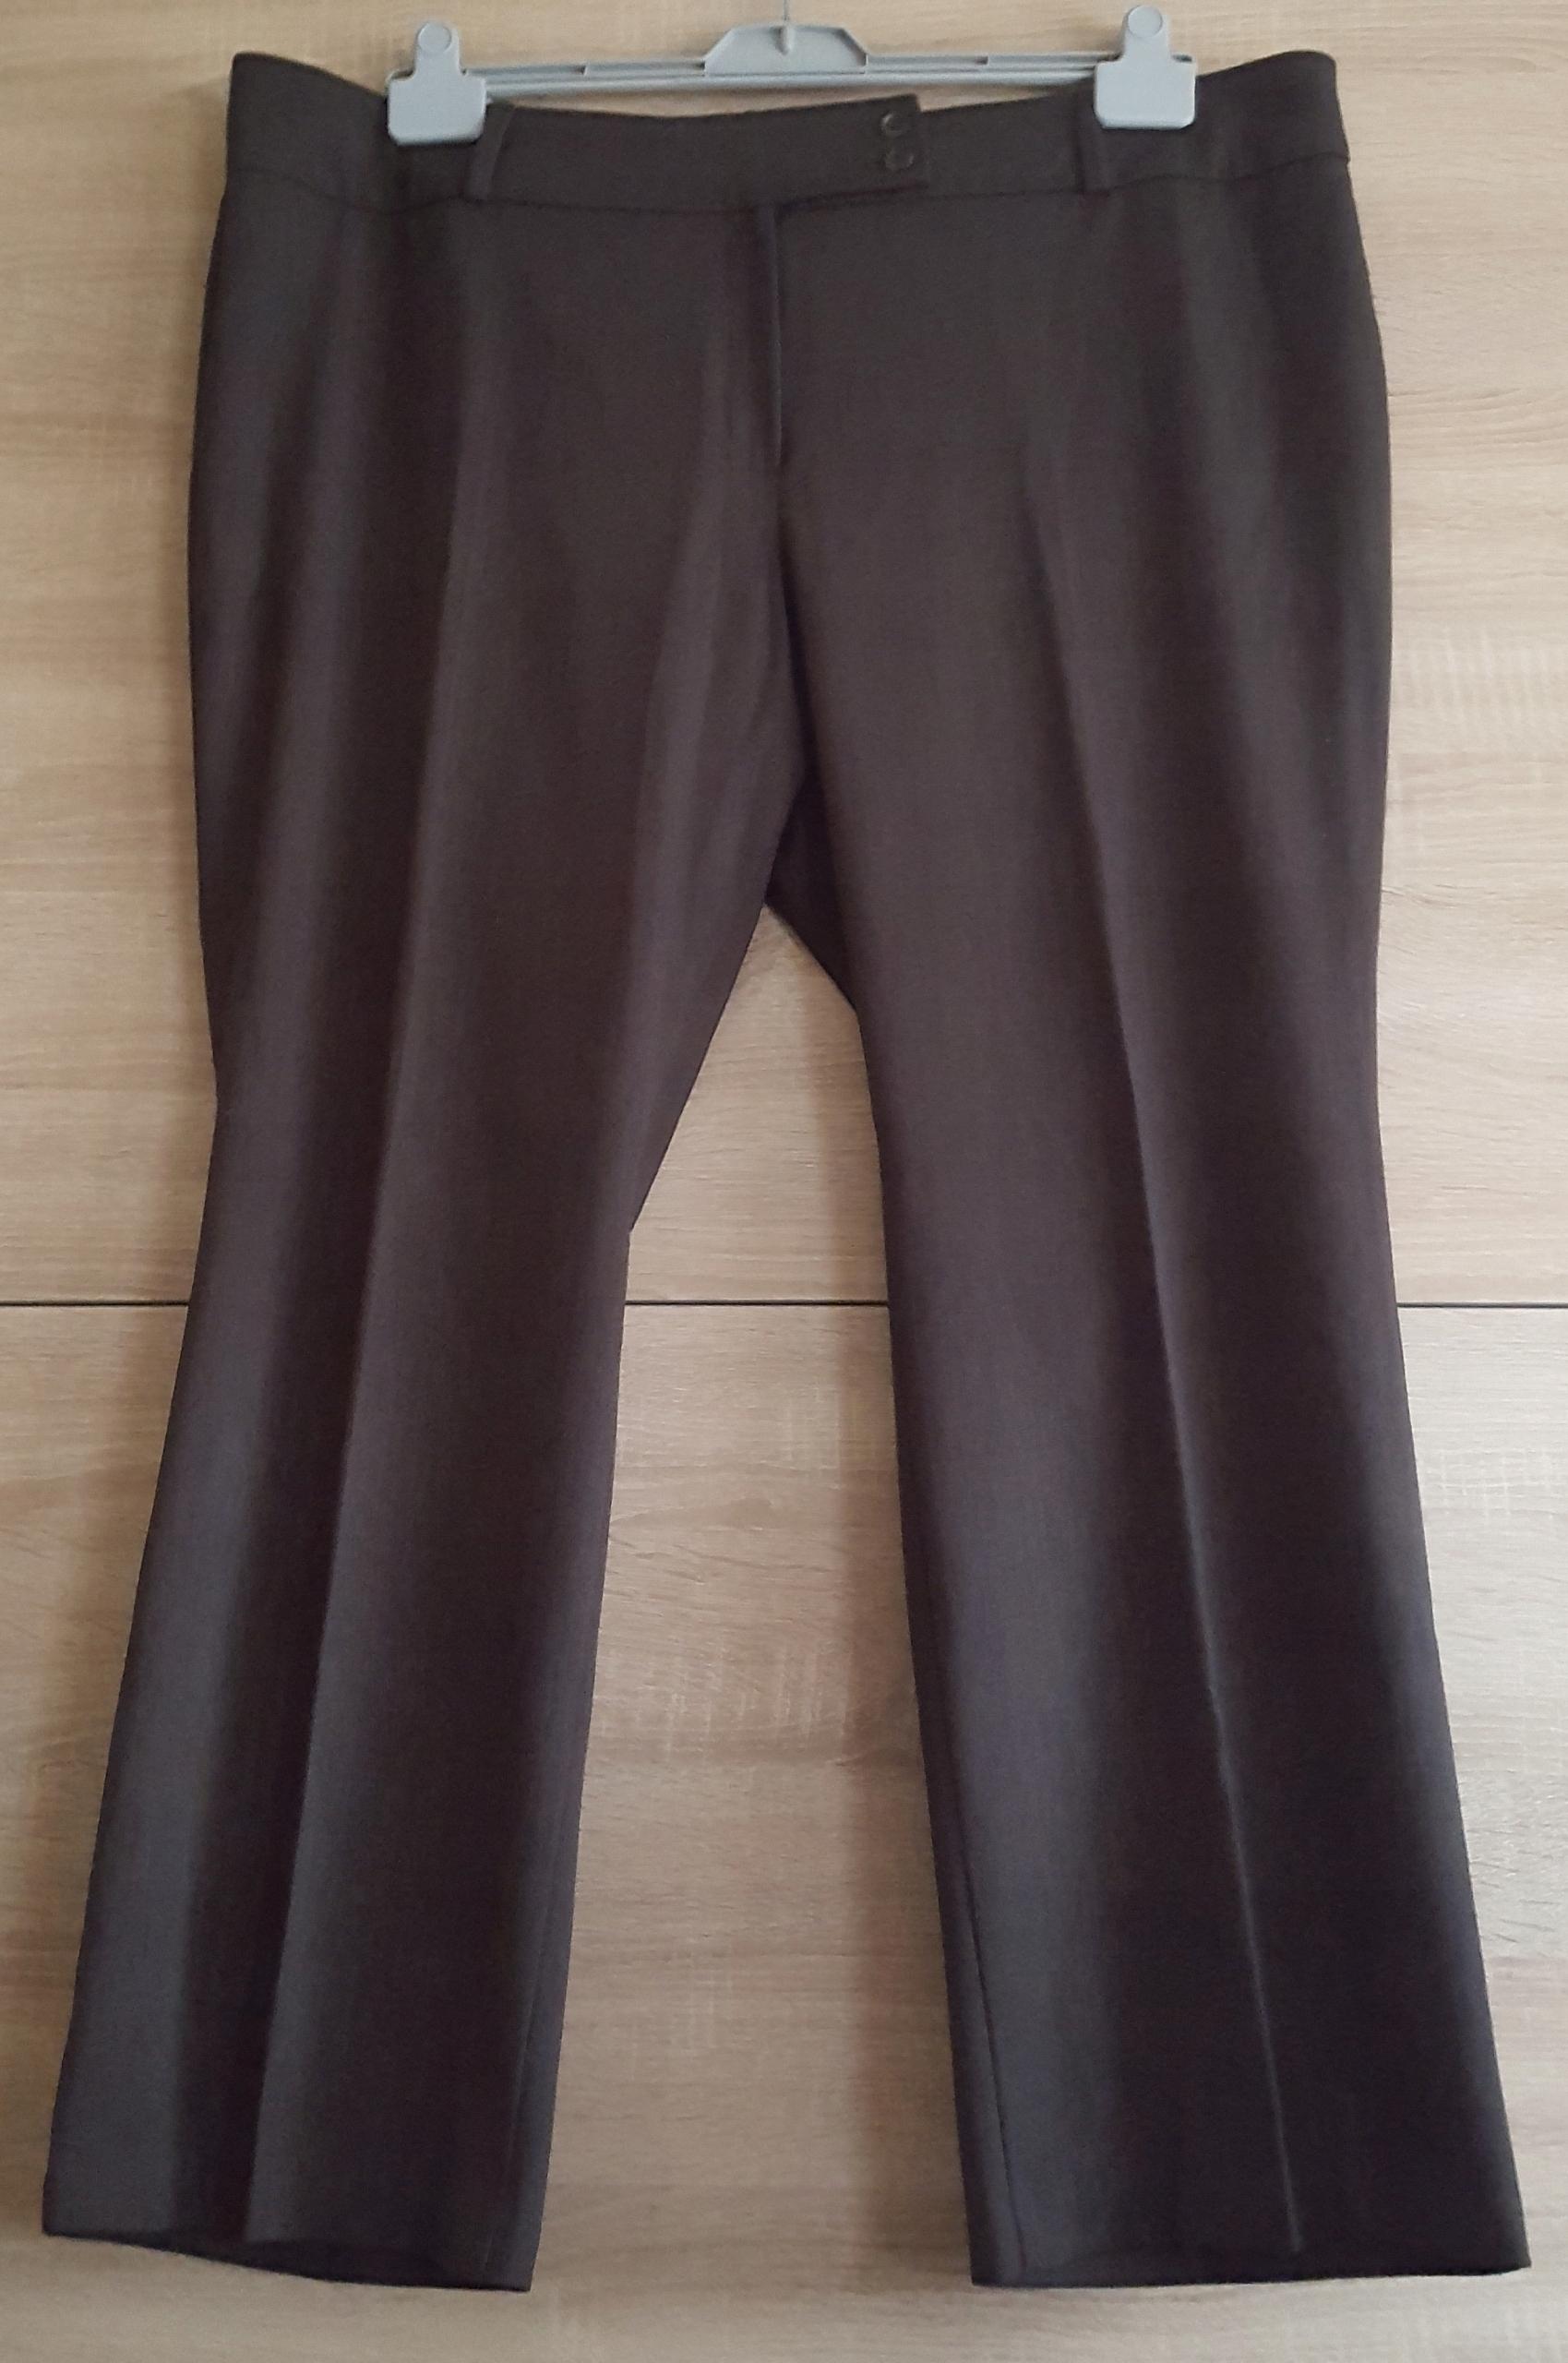 Spodnie damskie M&S rozmiar 48.